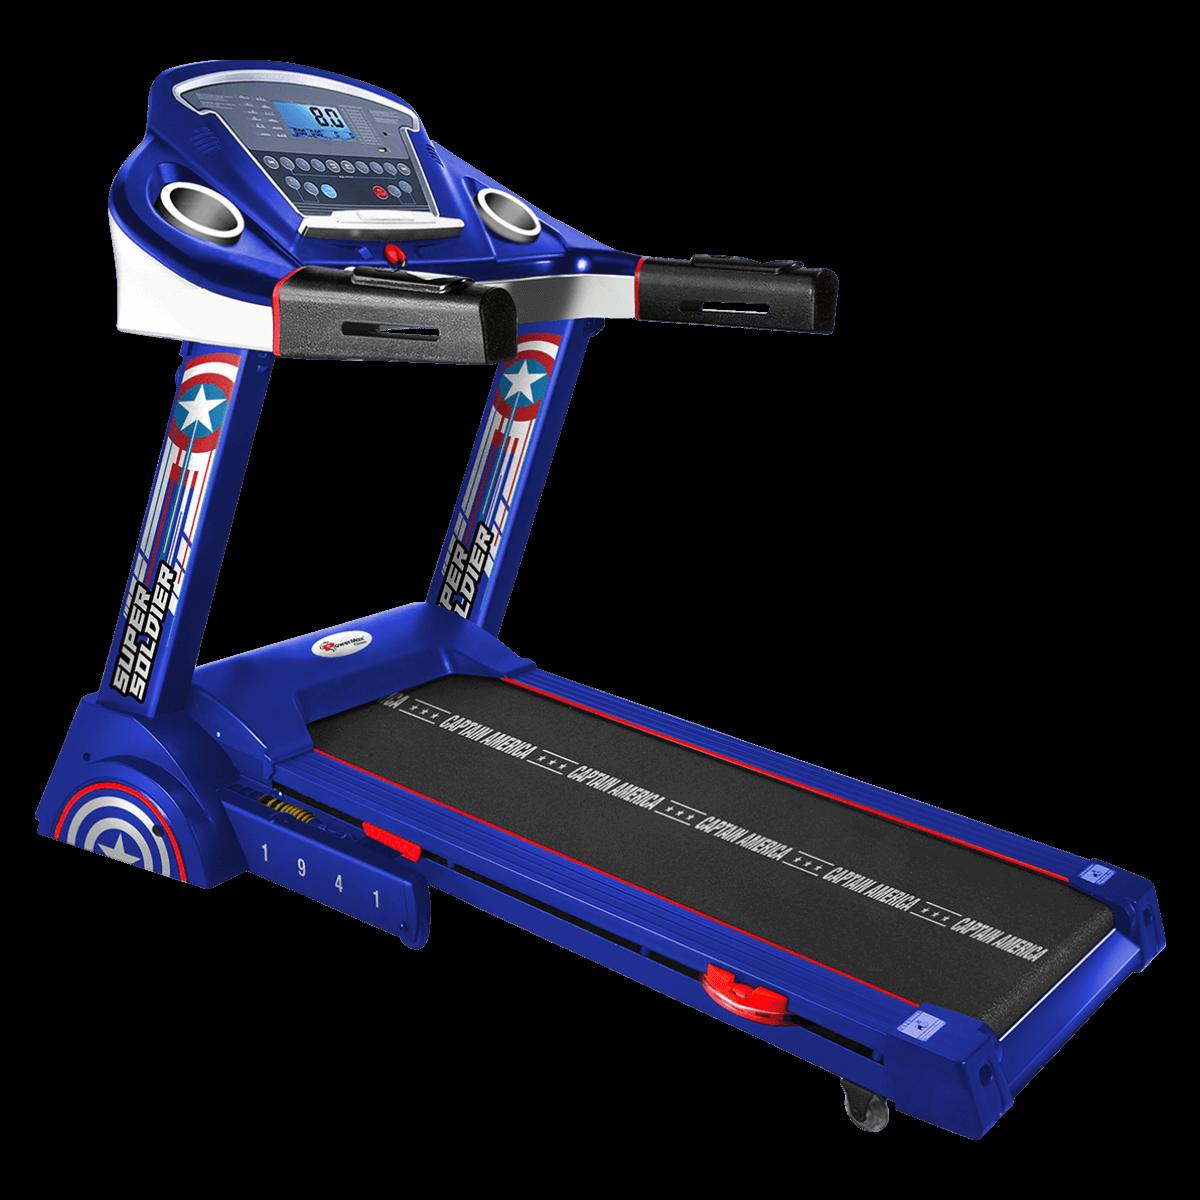 MTA-2300 Motorized Treadmill with Semi-Auto Lubrication